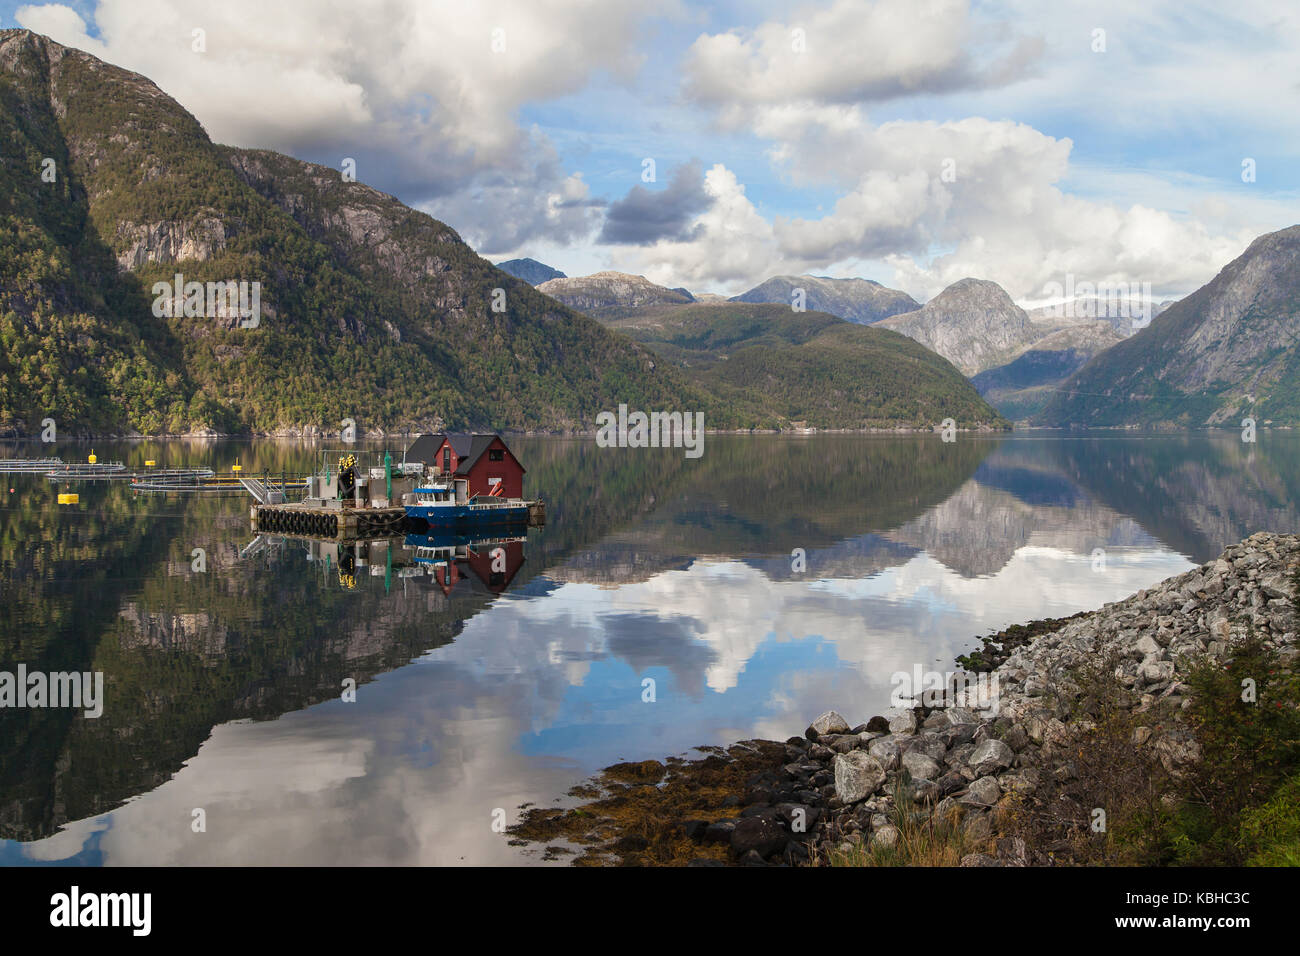 Fjord mauranger, branche de la fjord Hardanger, kvinnherad, hordaland, Norvège. Photo Stock